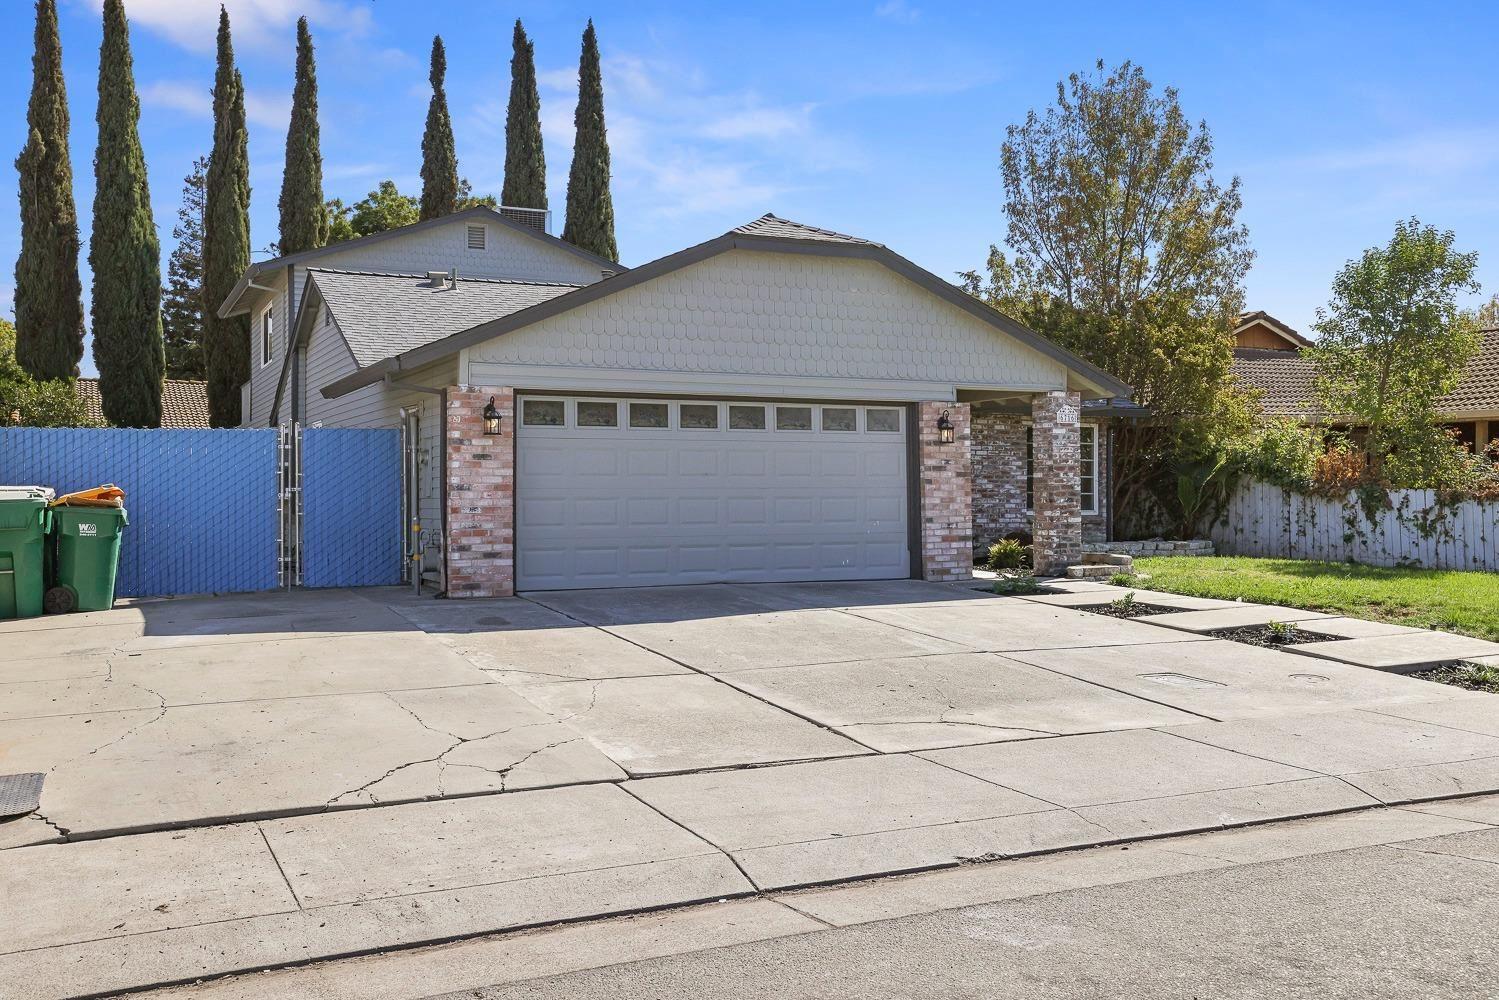 6716 Ector Way, Stockton, CA 95210 - MLS#: 221125863